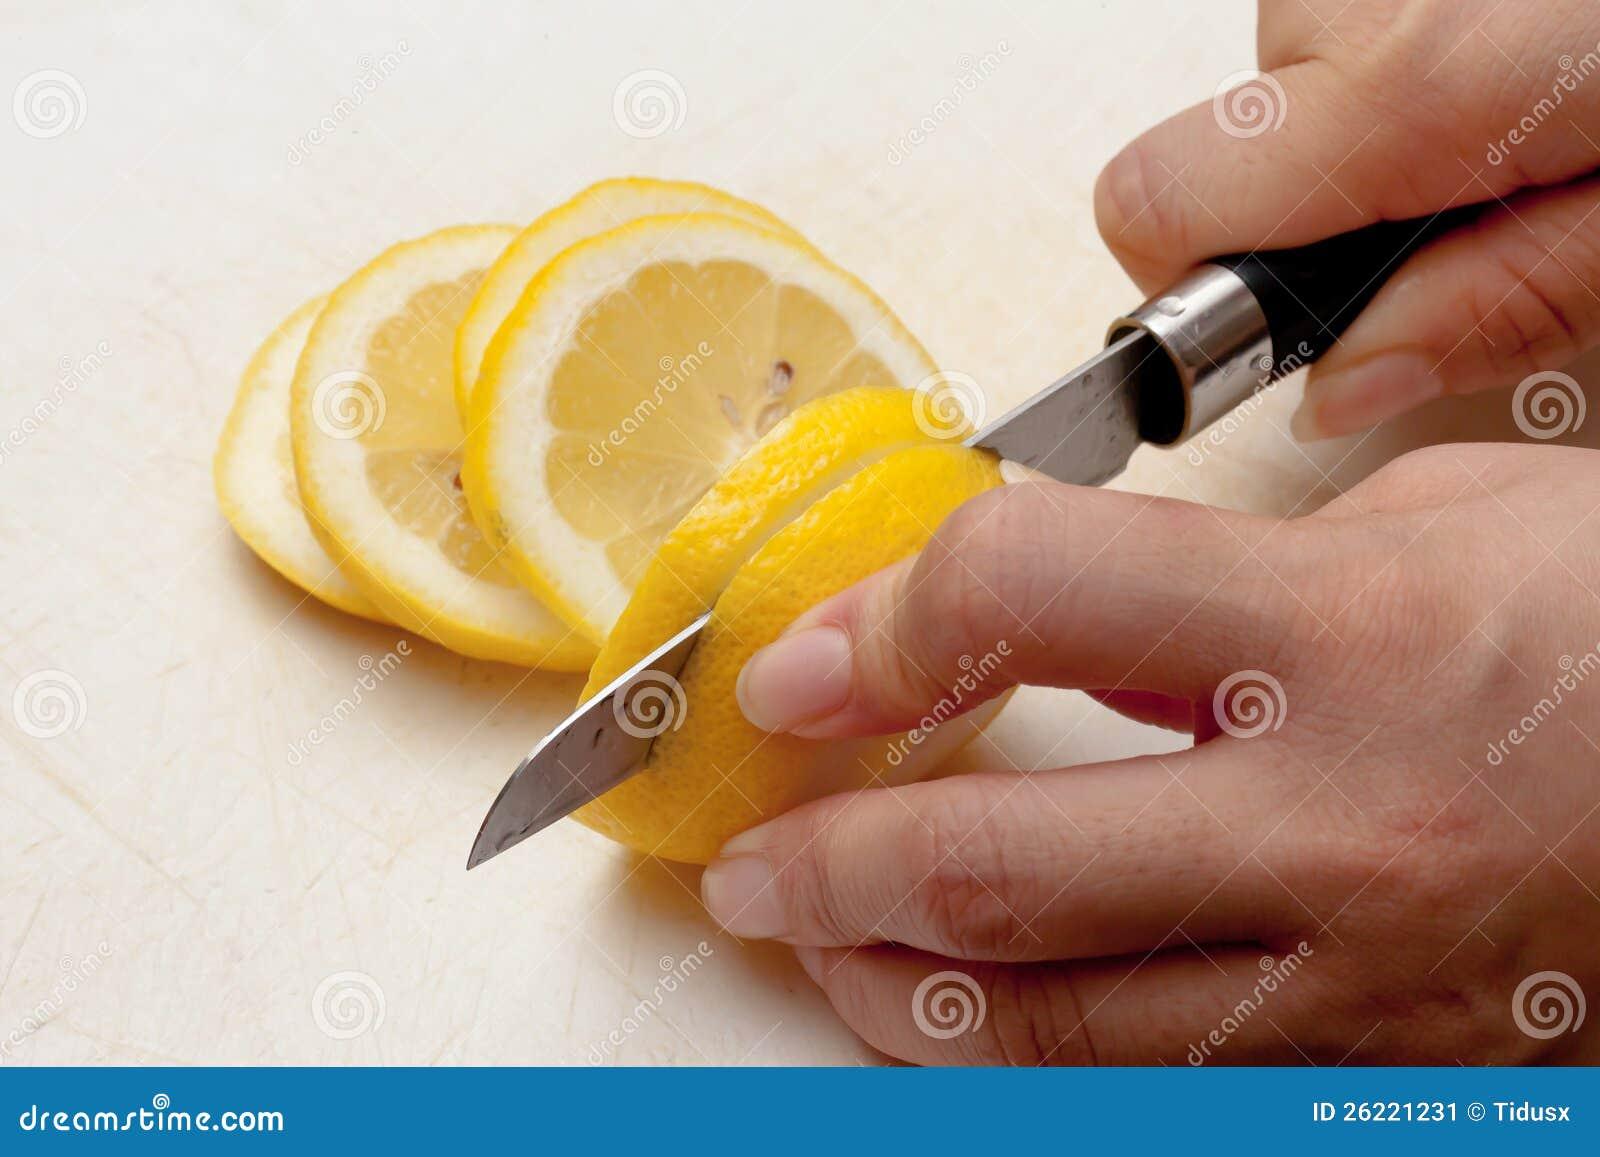 Cutting Lemon stock image. Image of grasp, slash, hand ...